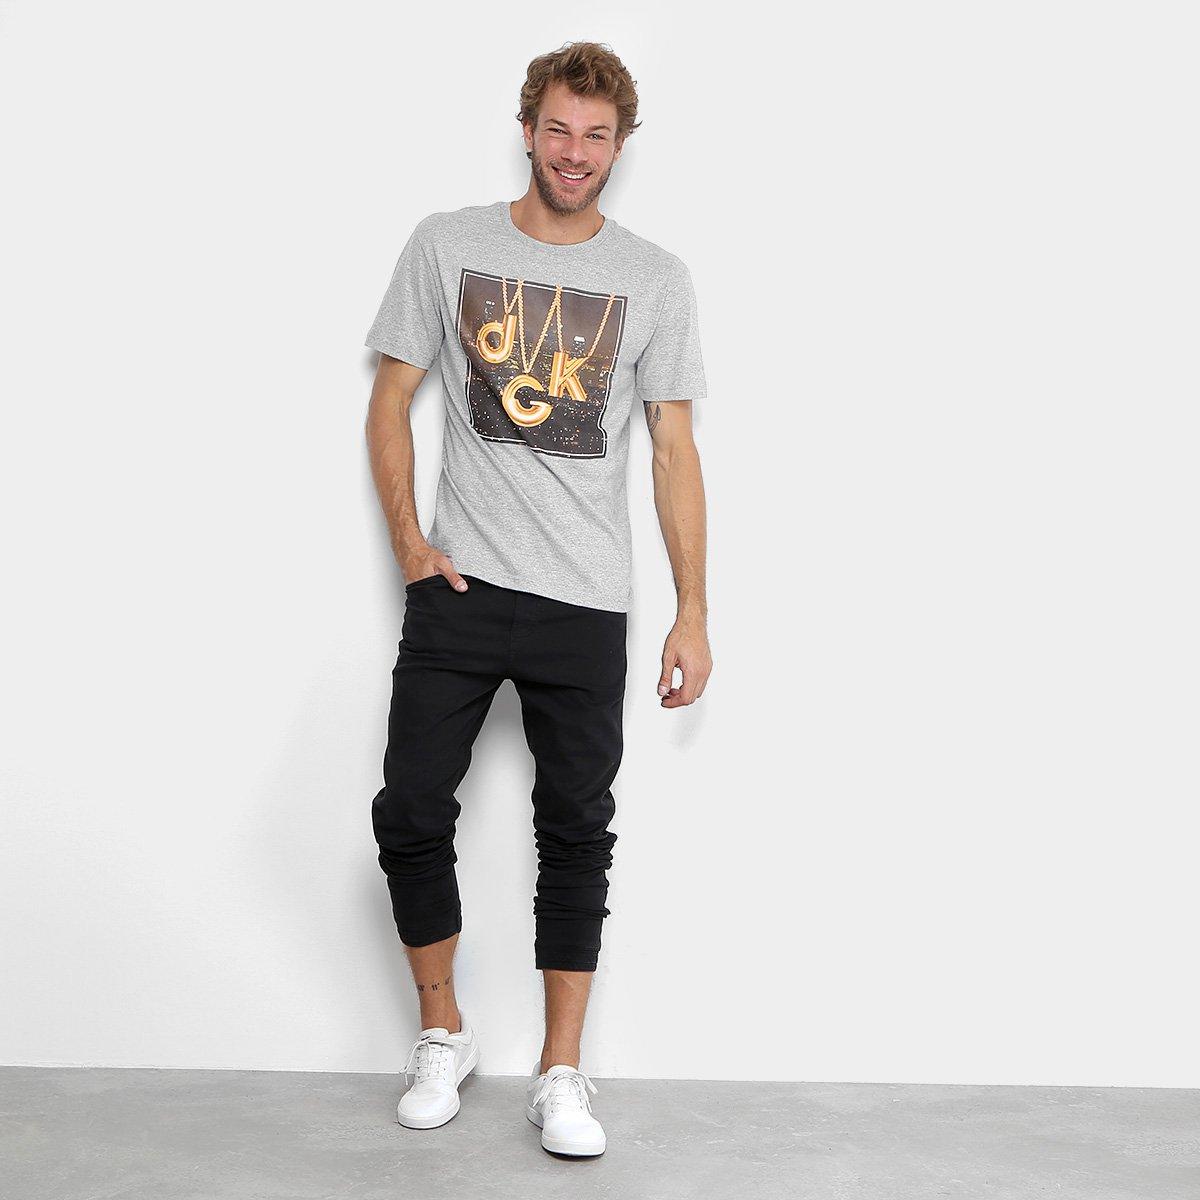 Camiseta DGK CITY LIGHTS TEE DT-3525 - Cinza - Compre Agora  cdba18ac26dd9